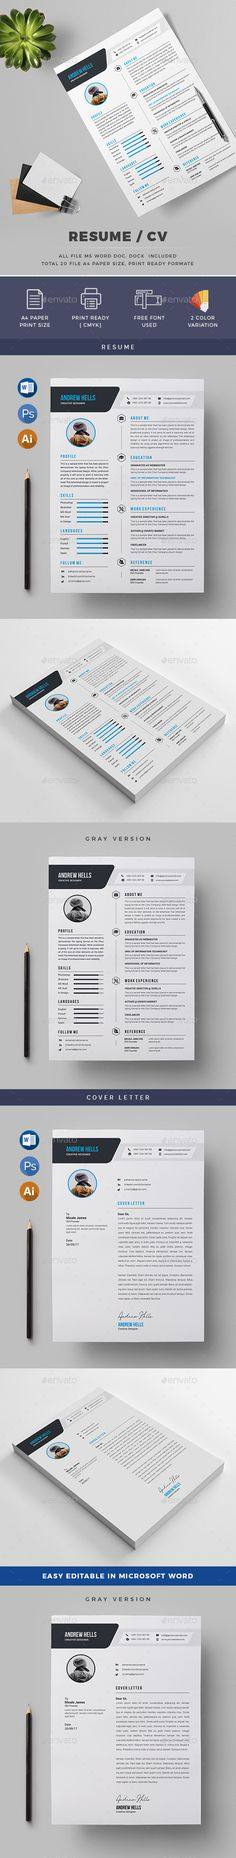 Word Resume Template, Resume ideas and Personal branding - resumedoc